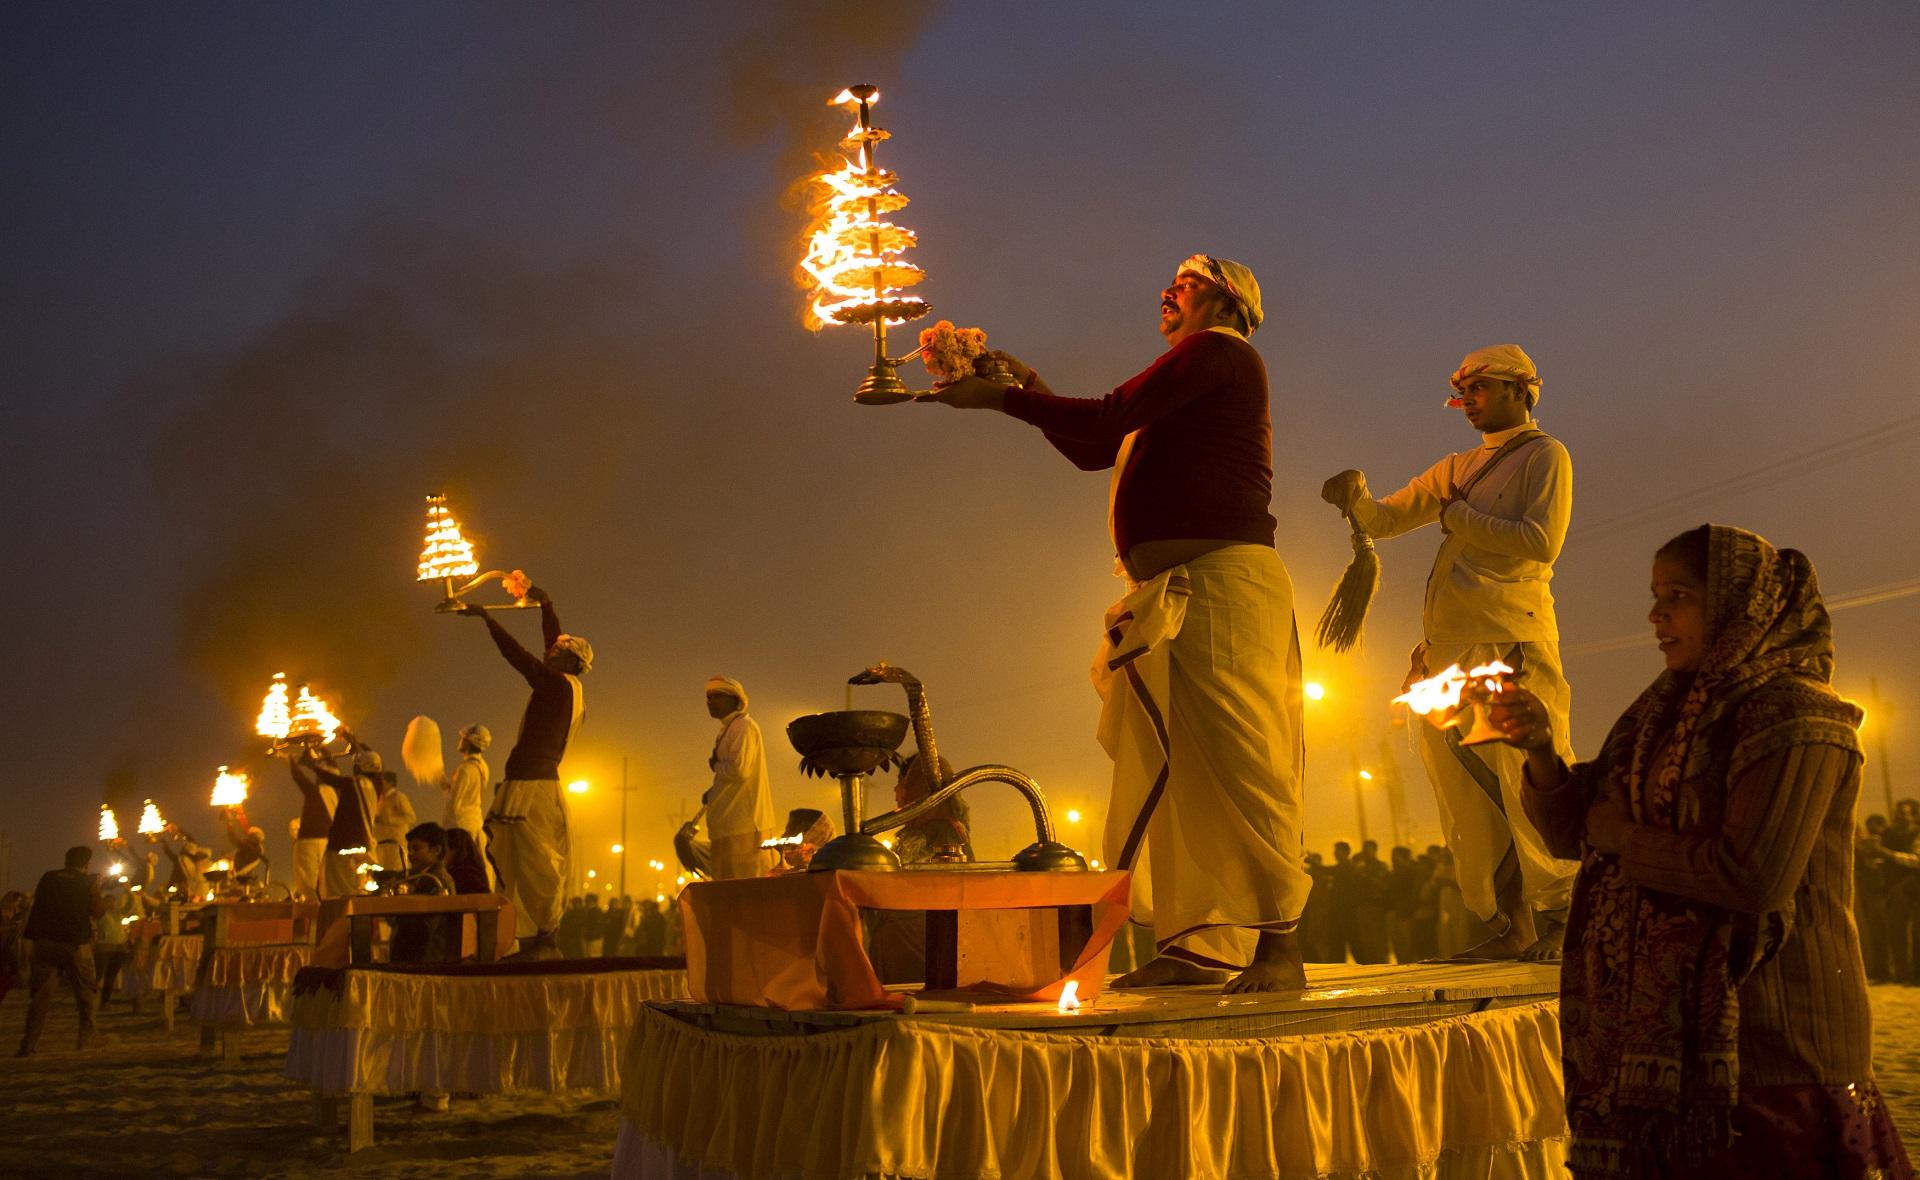 JOUR 2 : DELHI – HARIDWAR (TRAIN) – ROUTE VERS RISHIKESH